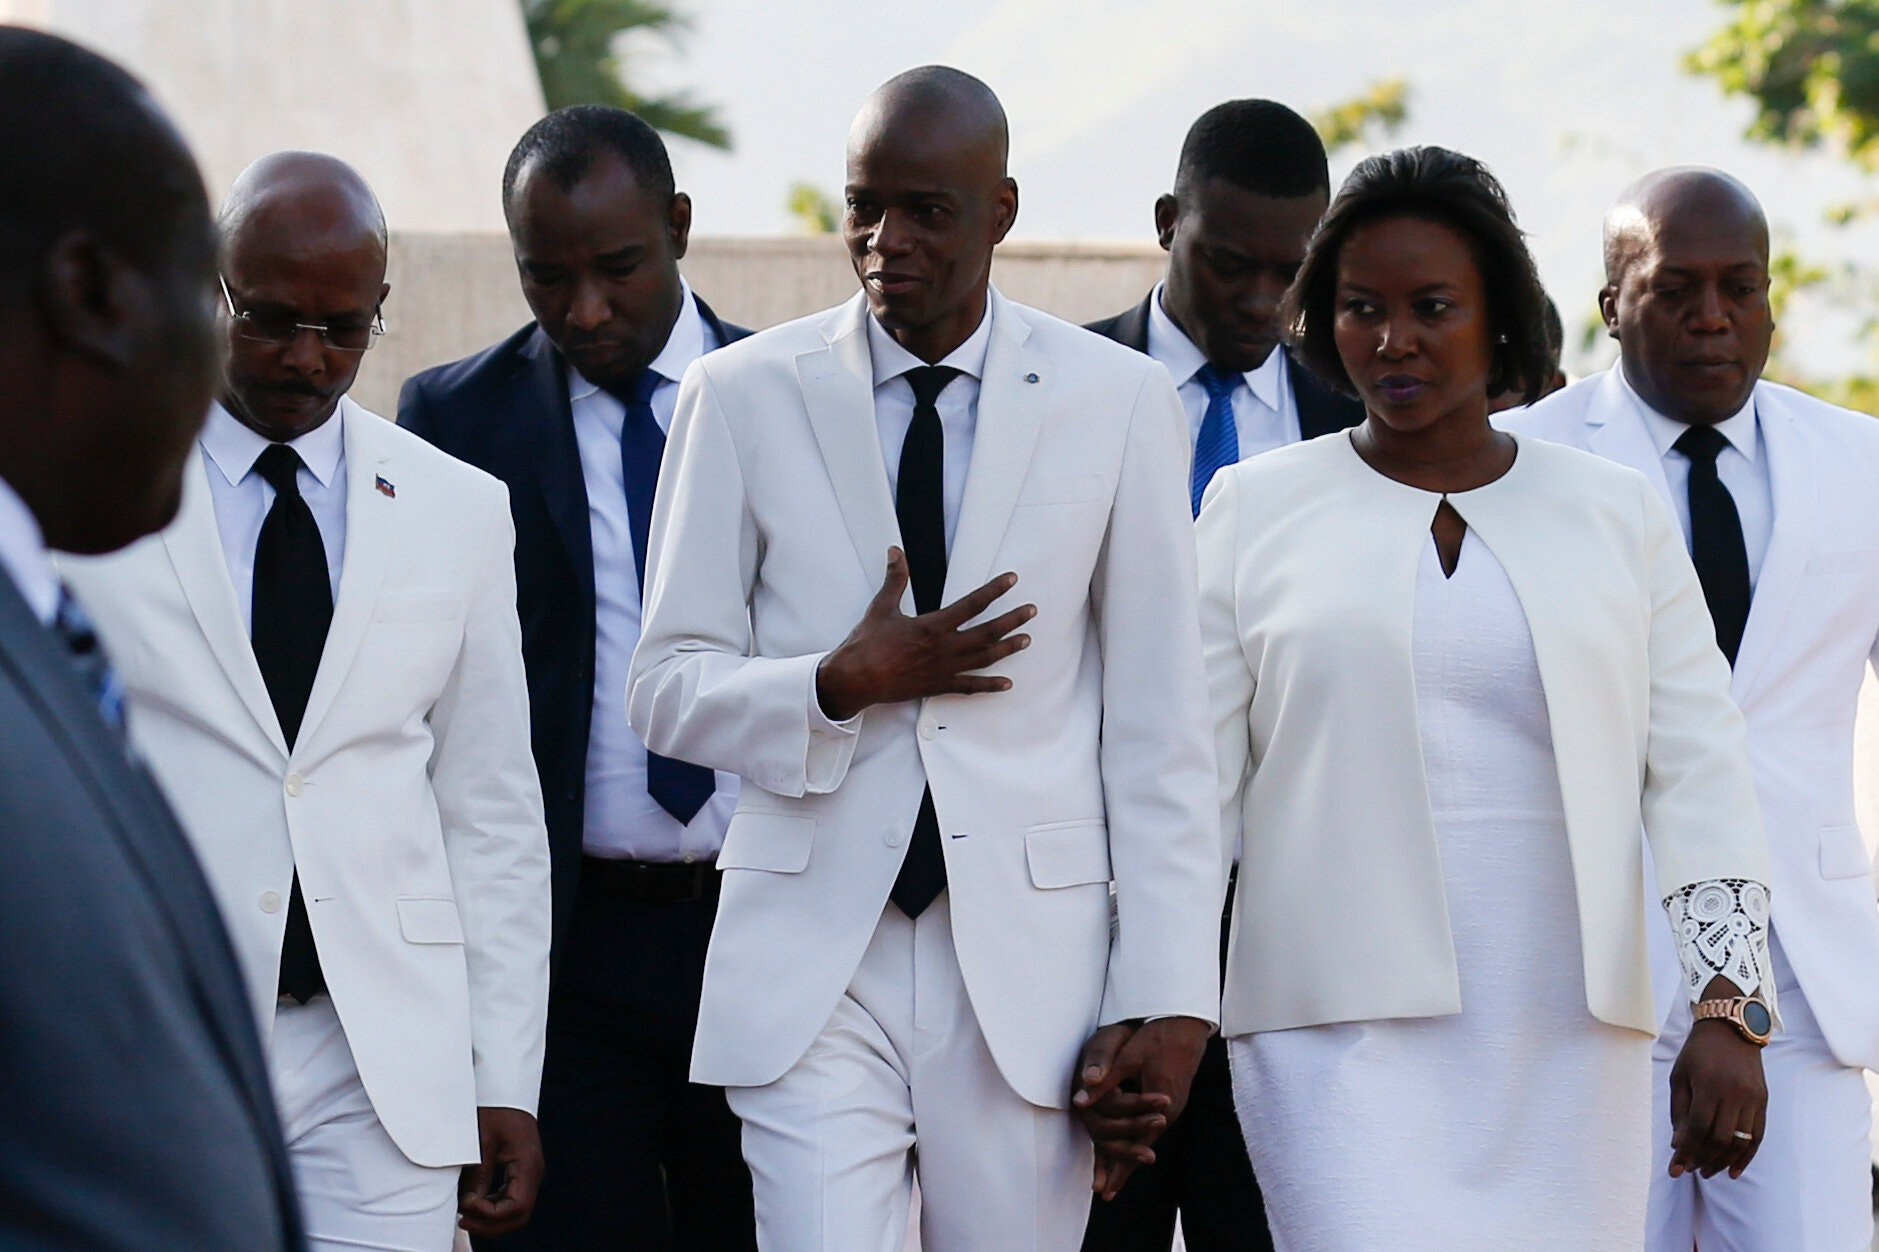 ?I don?t understand how nobody was shot,?- Haitian President?s widow questions how 30-50 bodyguards weren